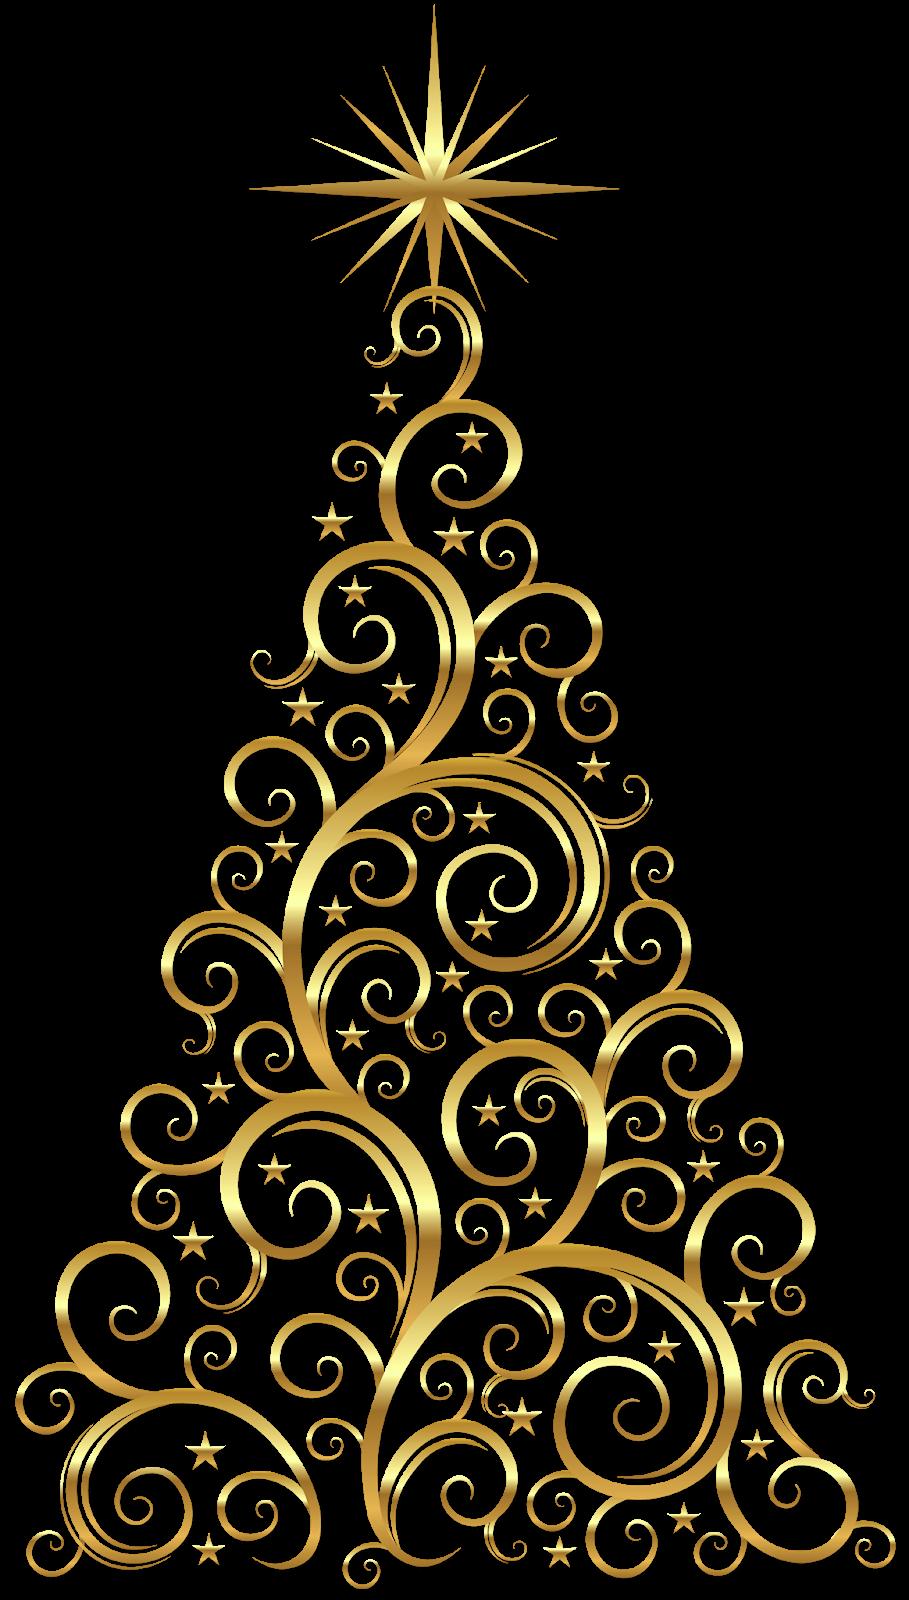 Christmas Tree Png Vector Christmas Png Image Clipart Png Sector Christmas Tree Png Vector Chris In 2020 Christmas Tree Clipart Clip Art Christmas Tree Images